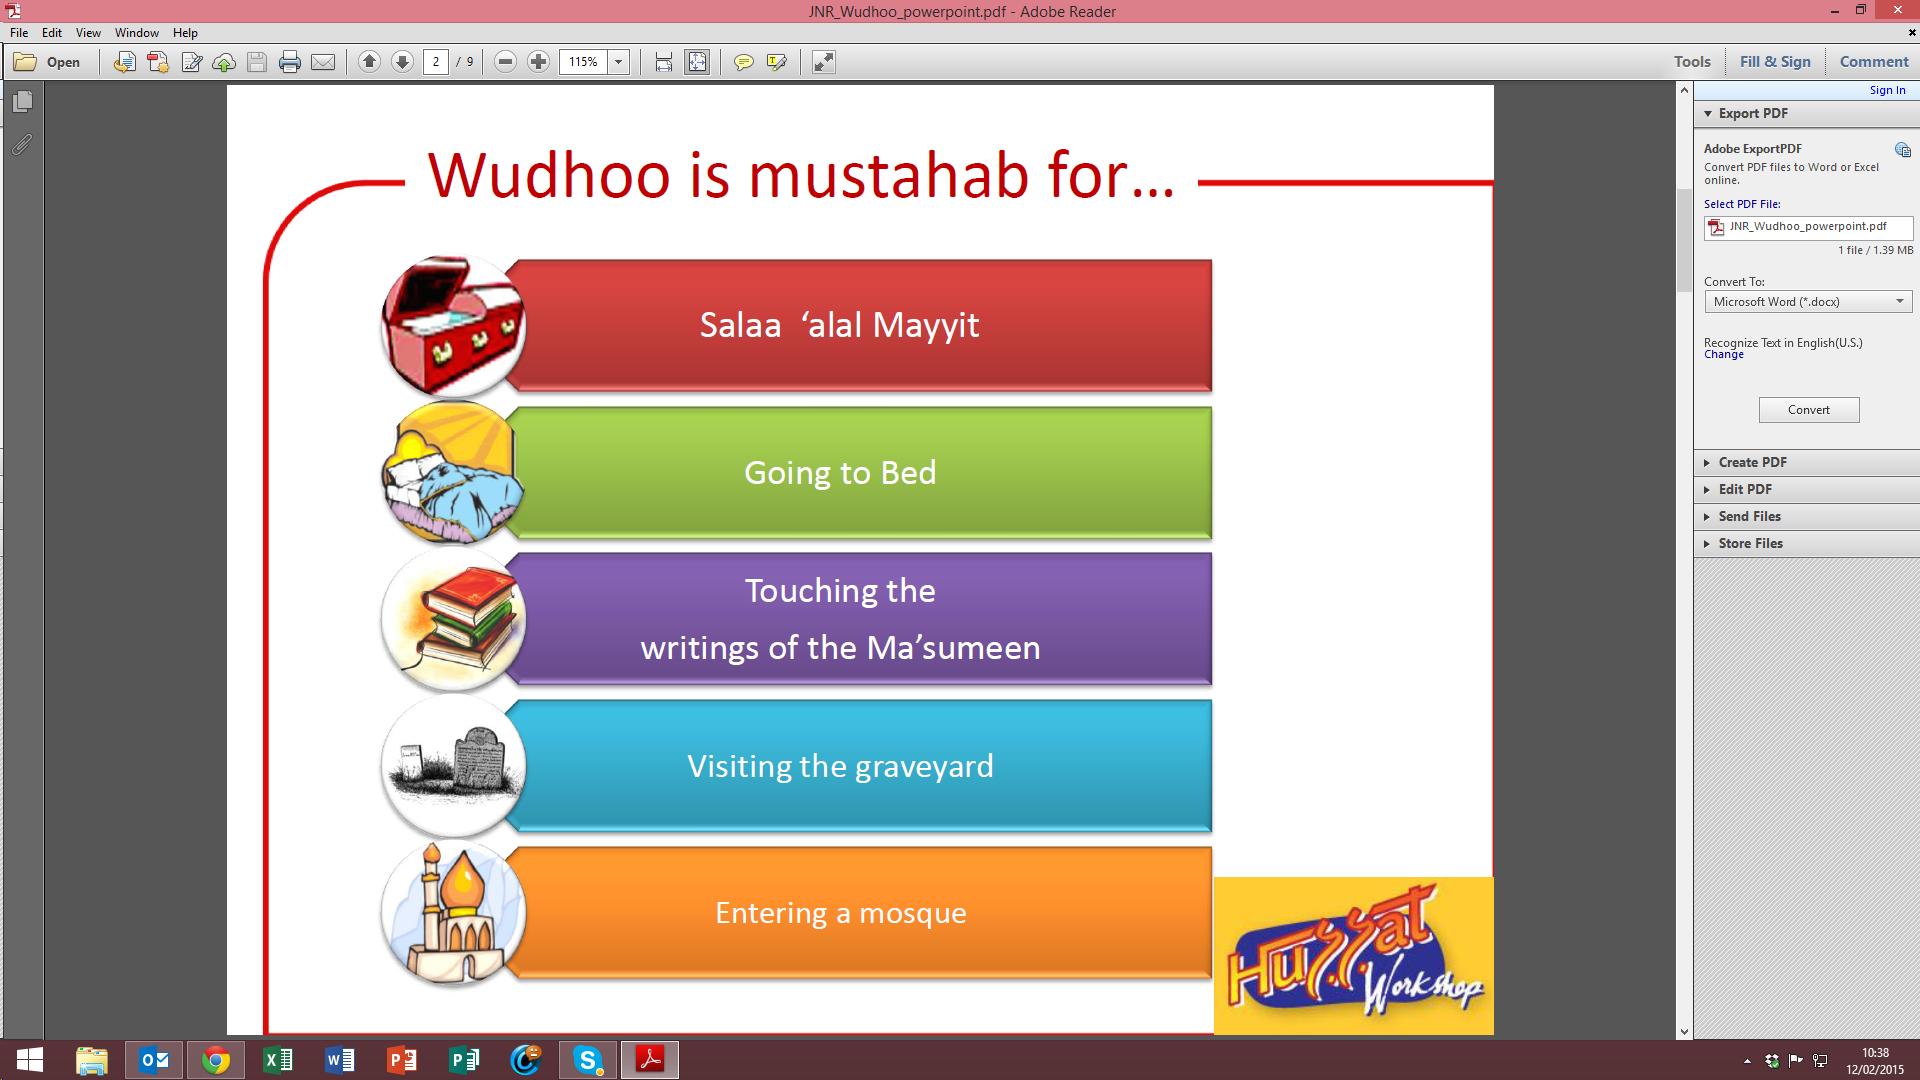 Wudhu Series – Idea 5: This powerpoint presentation